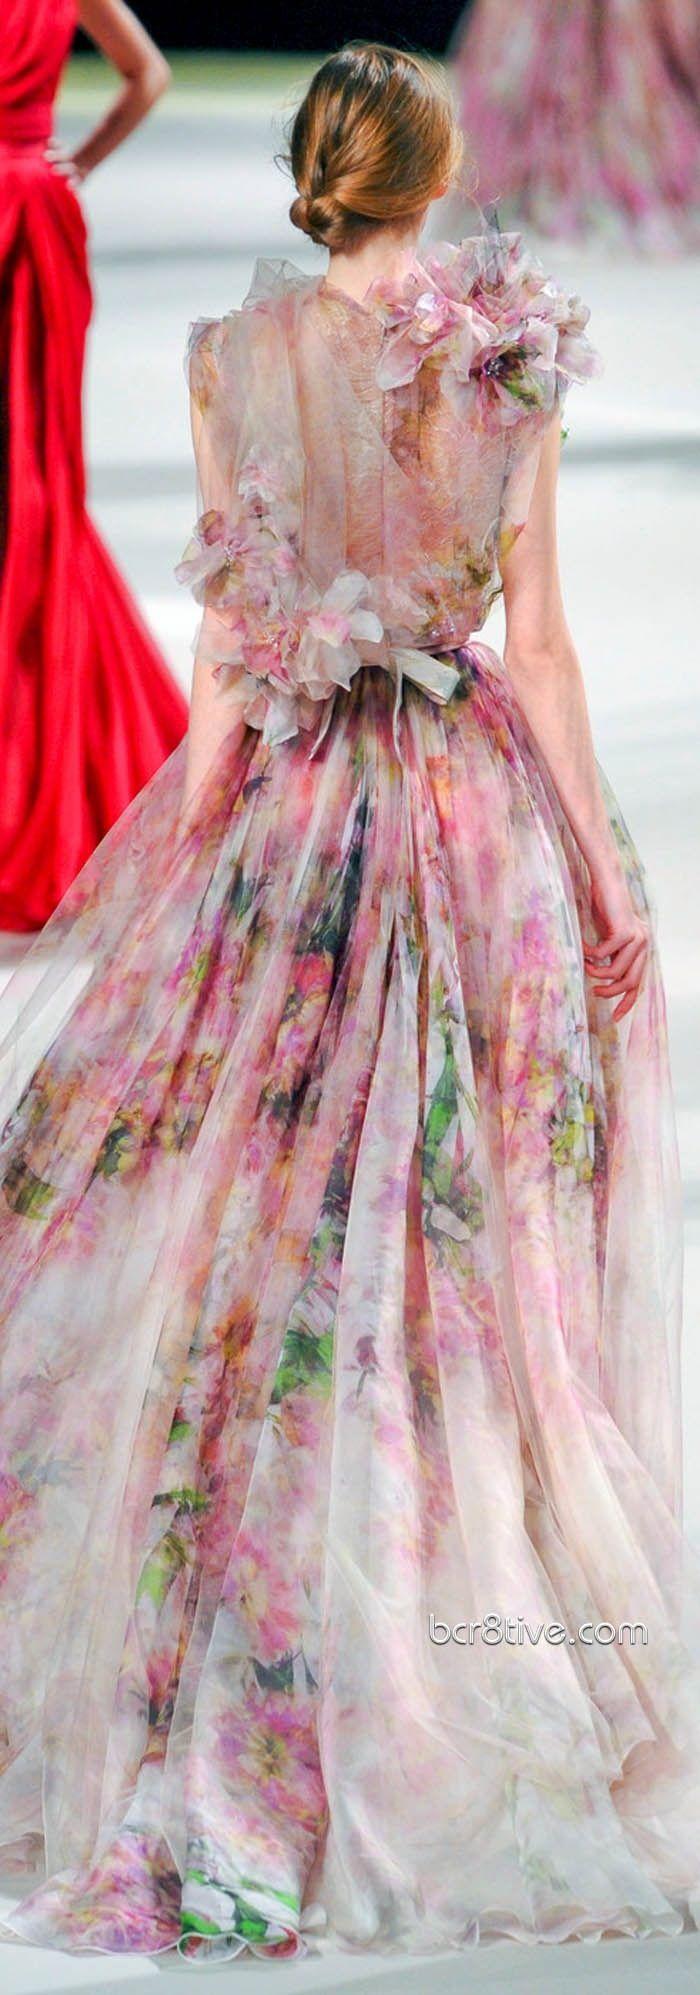 Pastel flower dress #pastel #pasteldress #flowerdress | Fashion ...